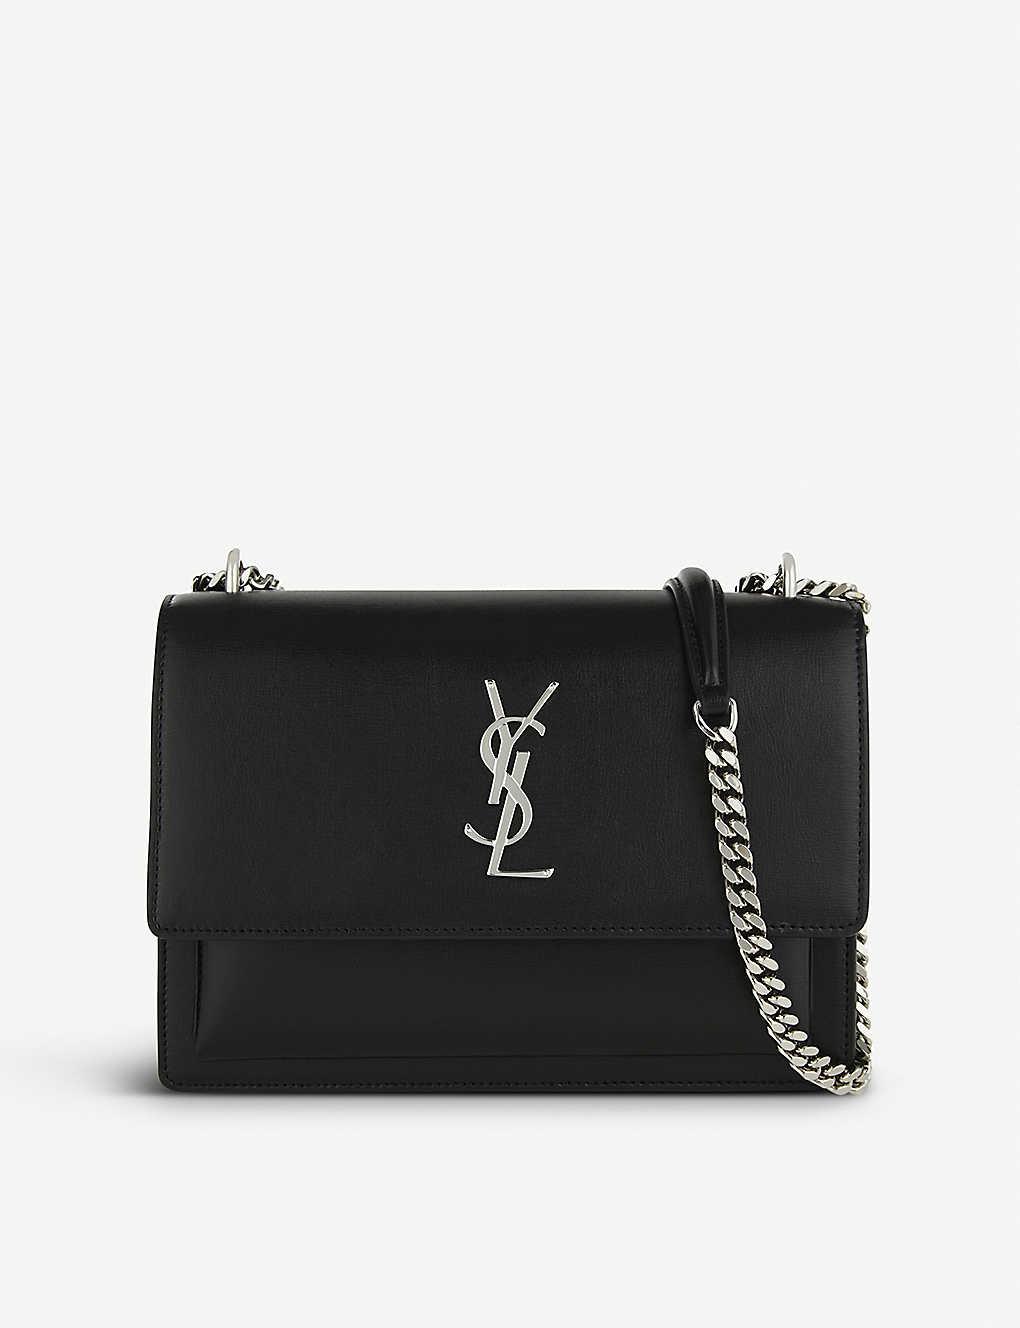 077515ea834 SAINT LAURENT - Monogram Sunset medium leather cross-body bag ...